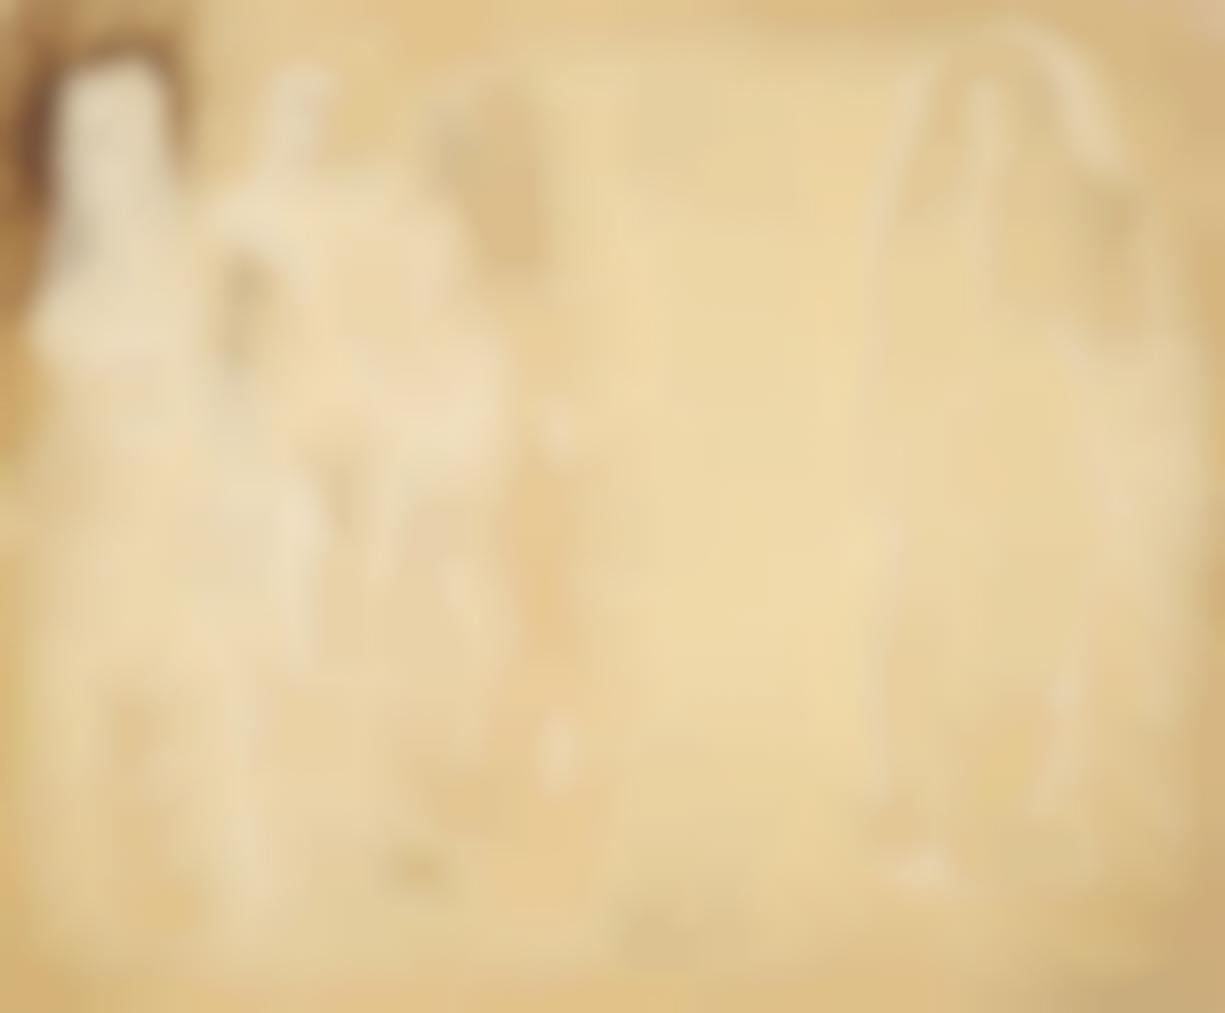 Barbara Hepworth-Group Of Figures And Head (Burnt Umber)-1951